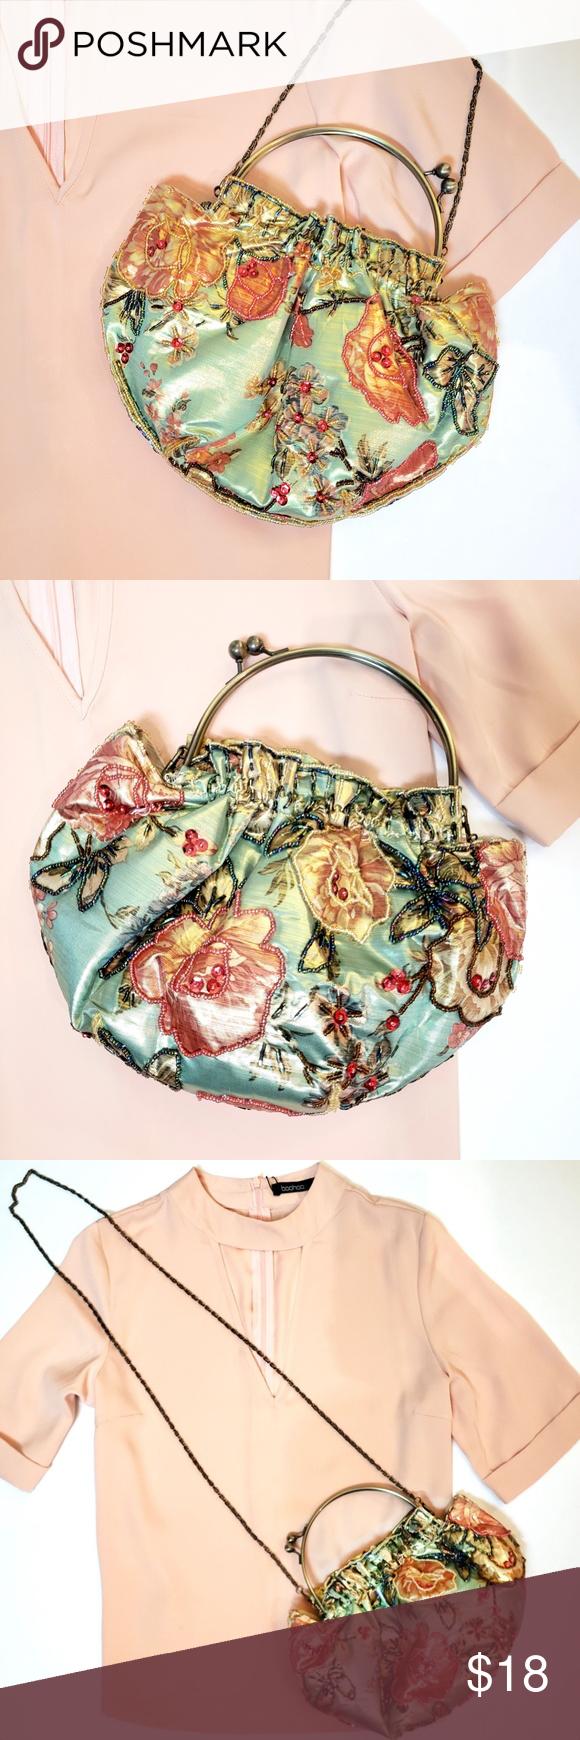 8ca491e5b3 JNS fabric bag w floral print